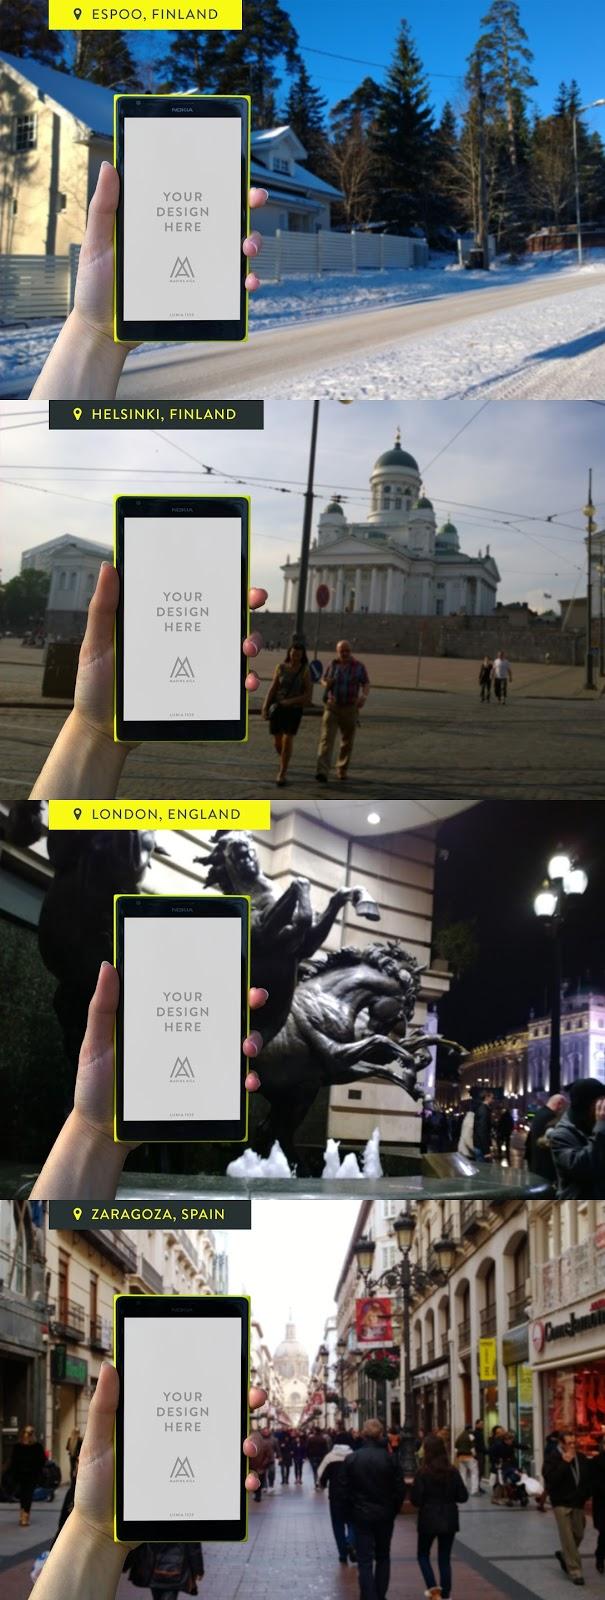 Mock-Up, mockup dosyası, mockup indir, lumia 1520 psd, akıllı telefon mockup indir, nokia mockup indir, psd dosyası, photoshop,